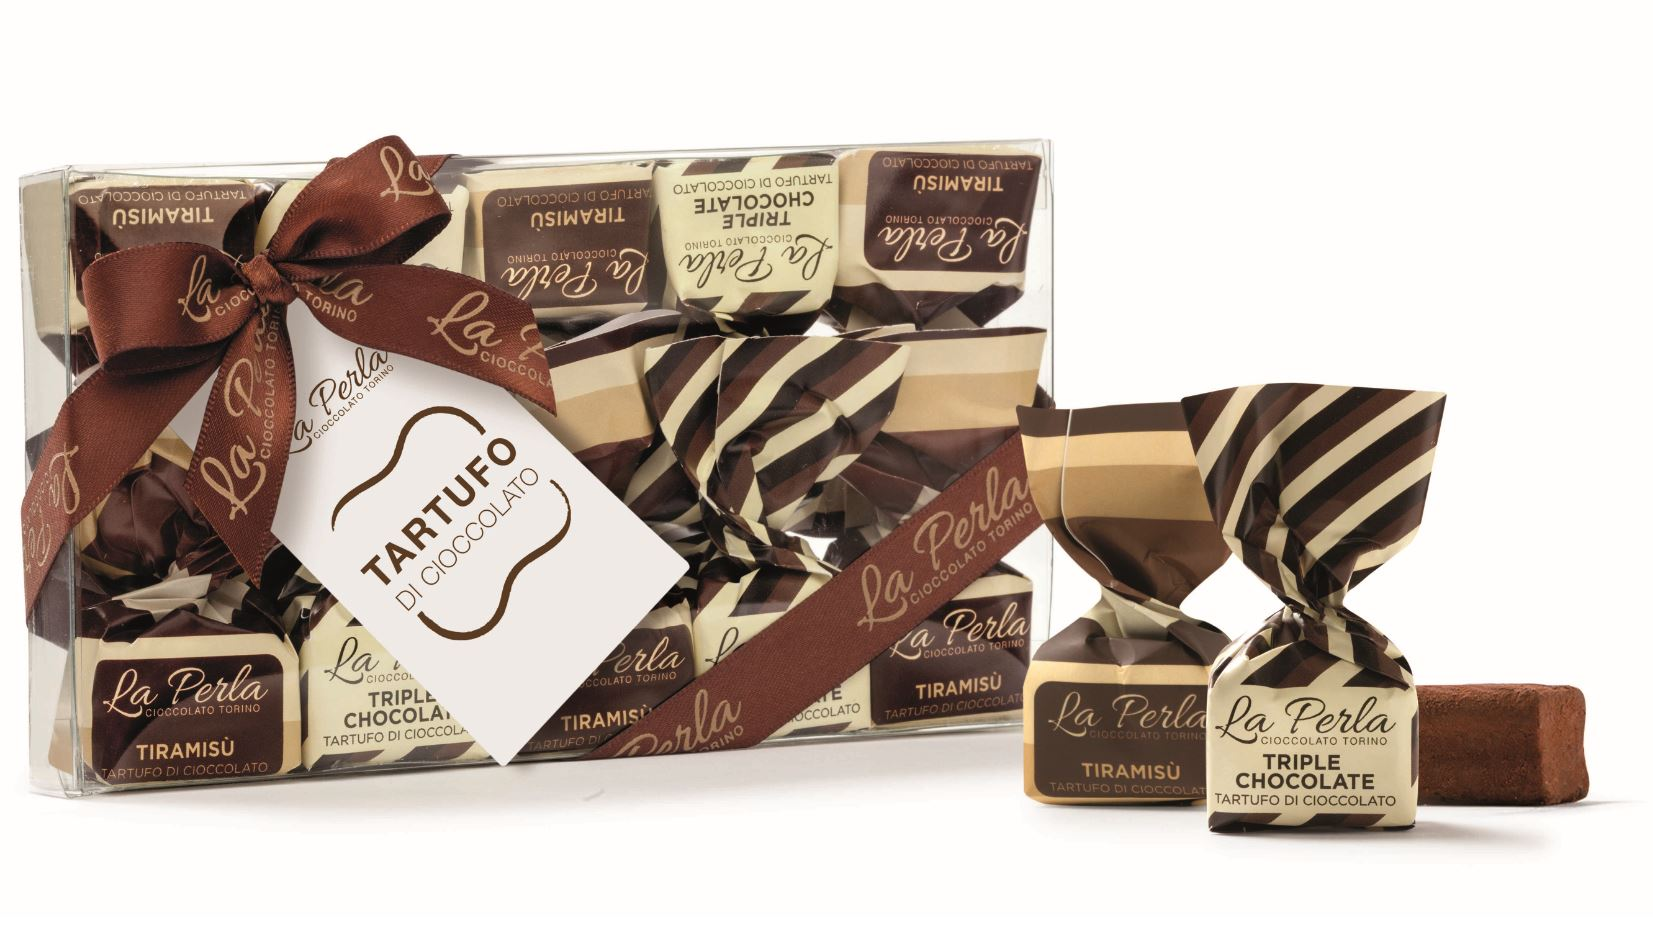 La Perla Tiramisu and Triple Chocolate Truffles 150g